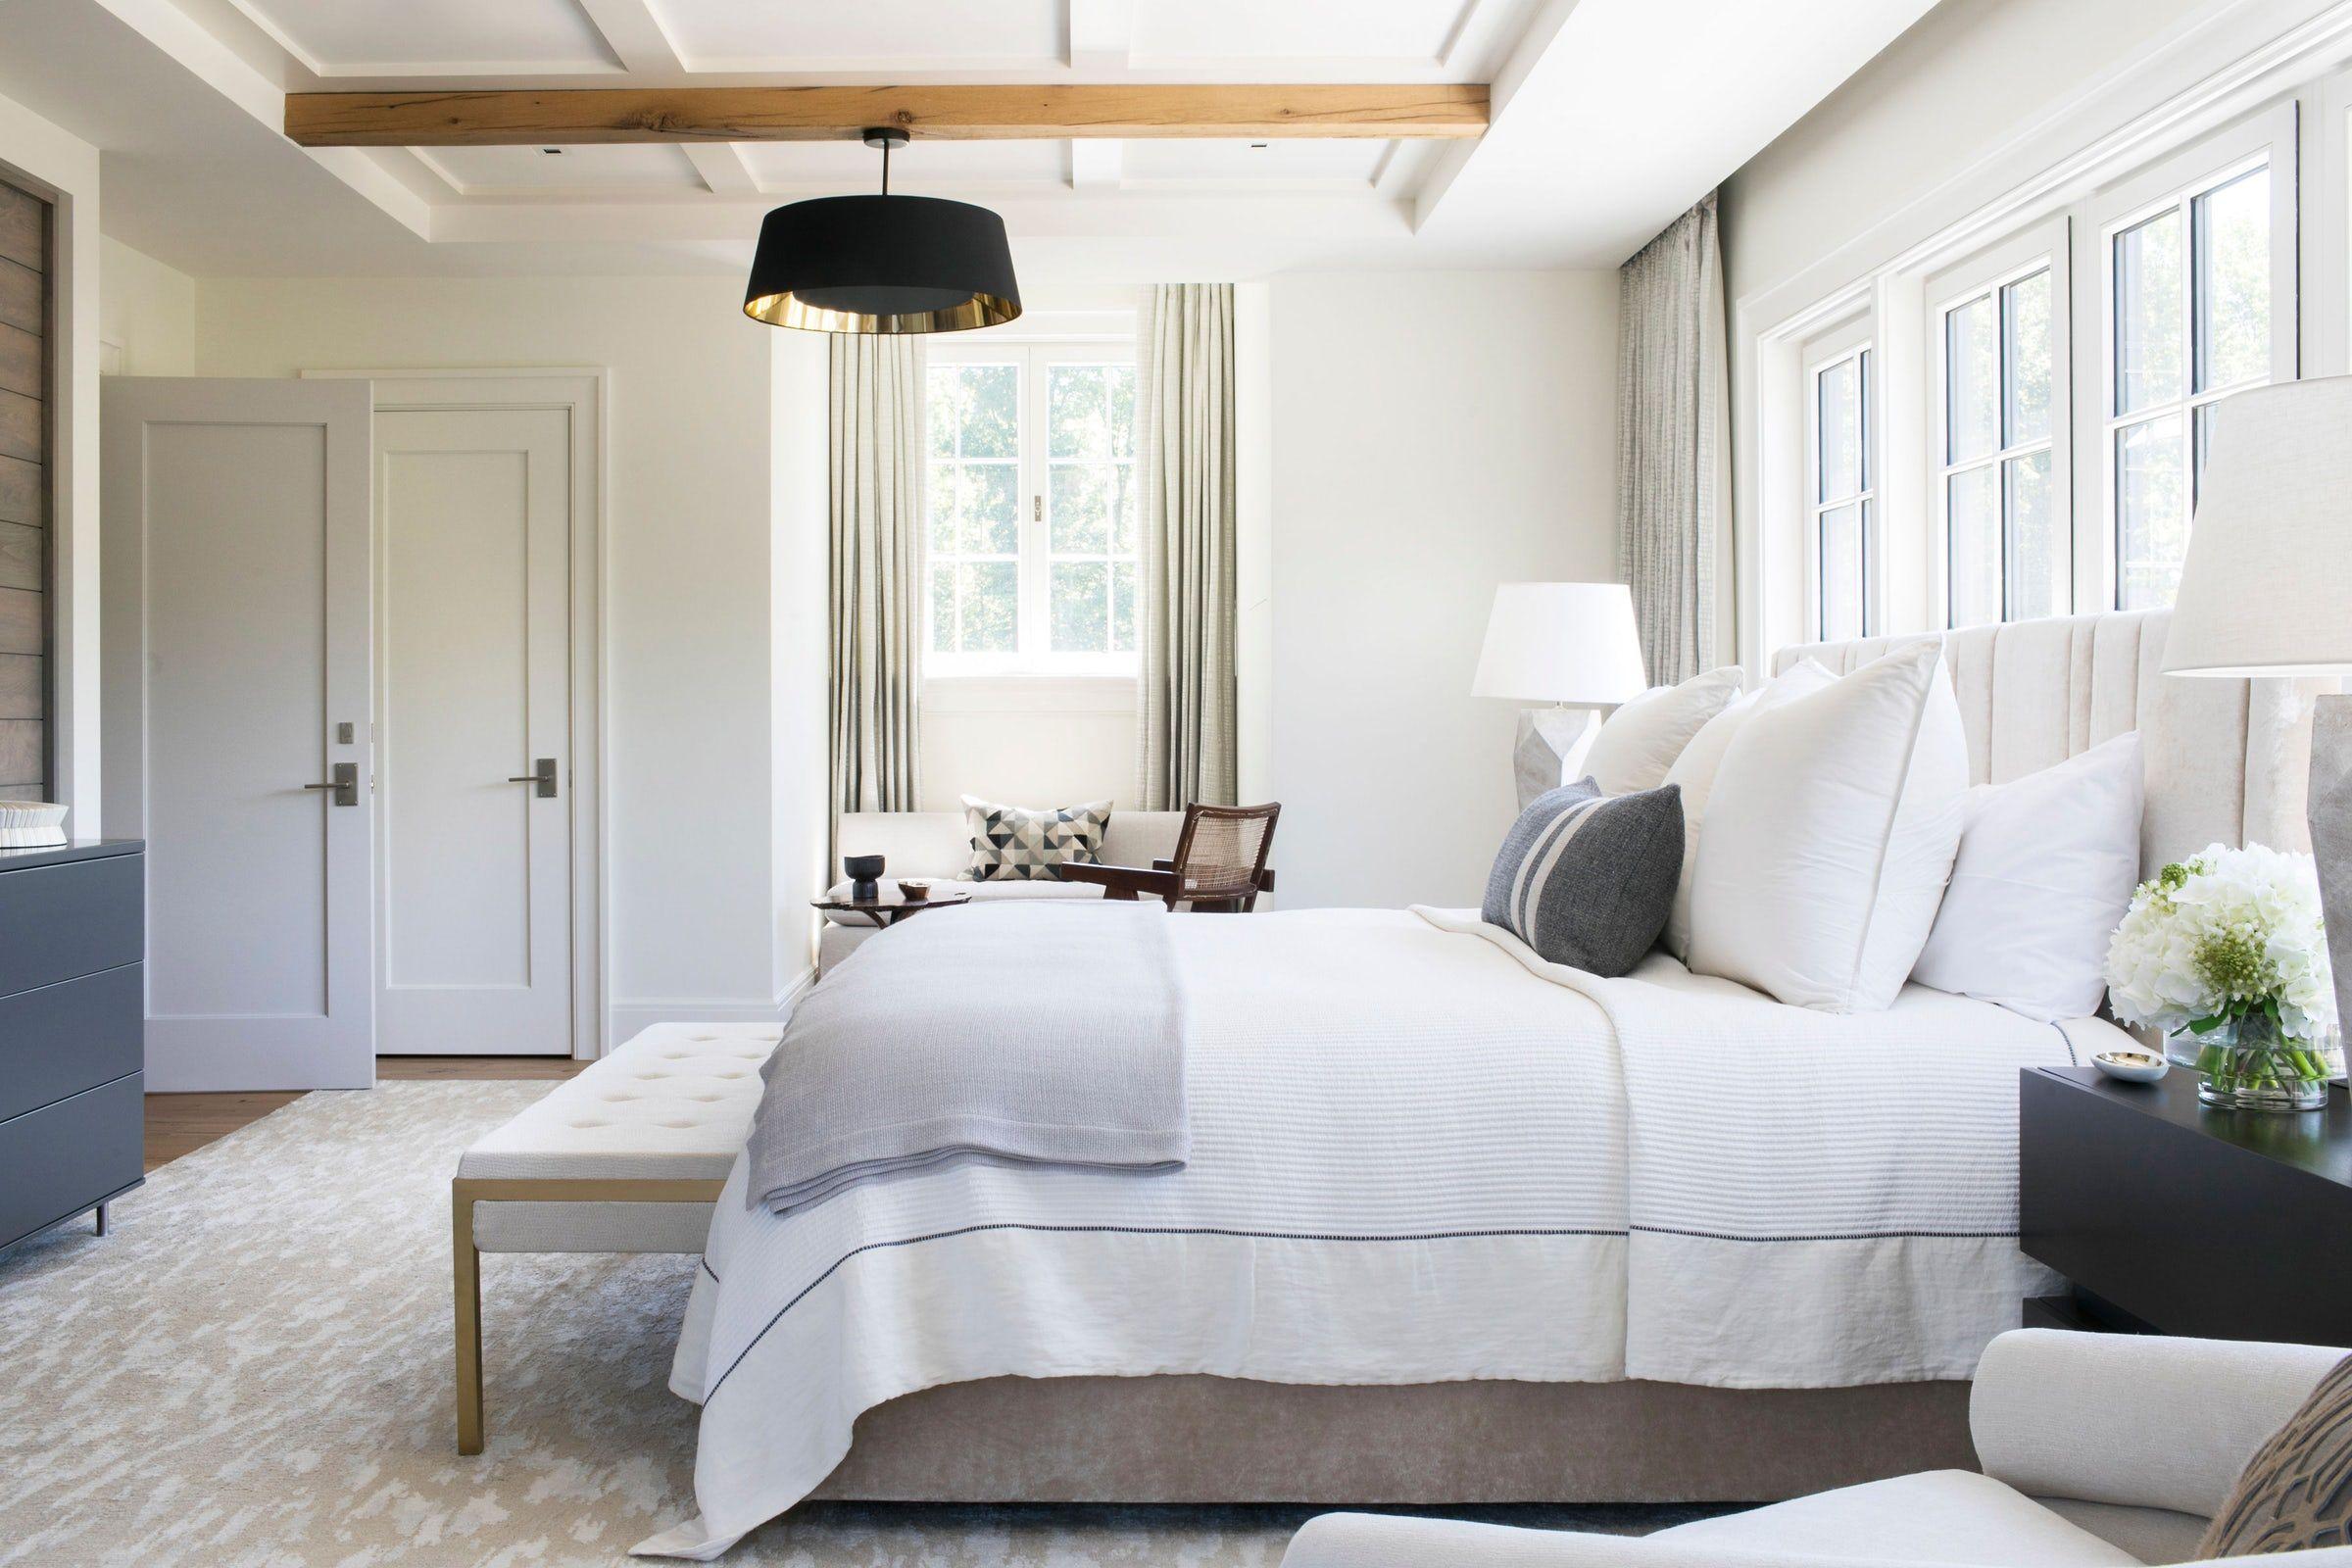 Bedroom decor ideas image by terri ricci interiors